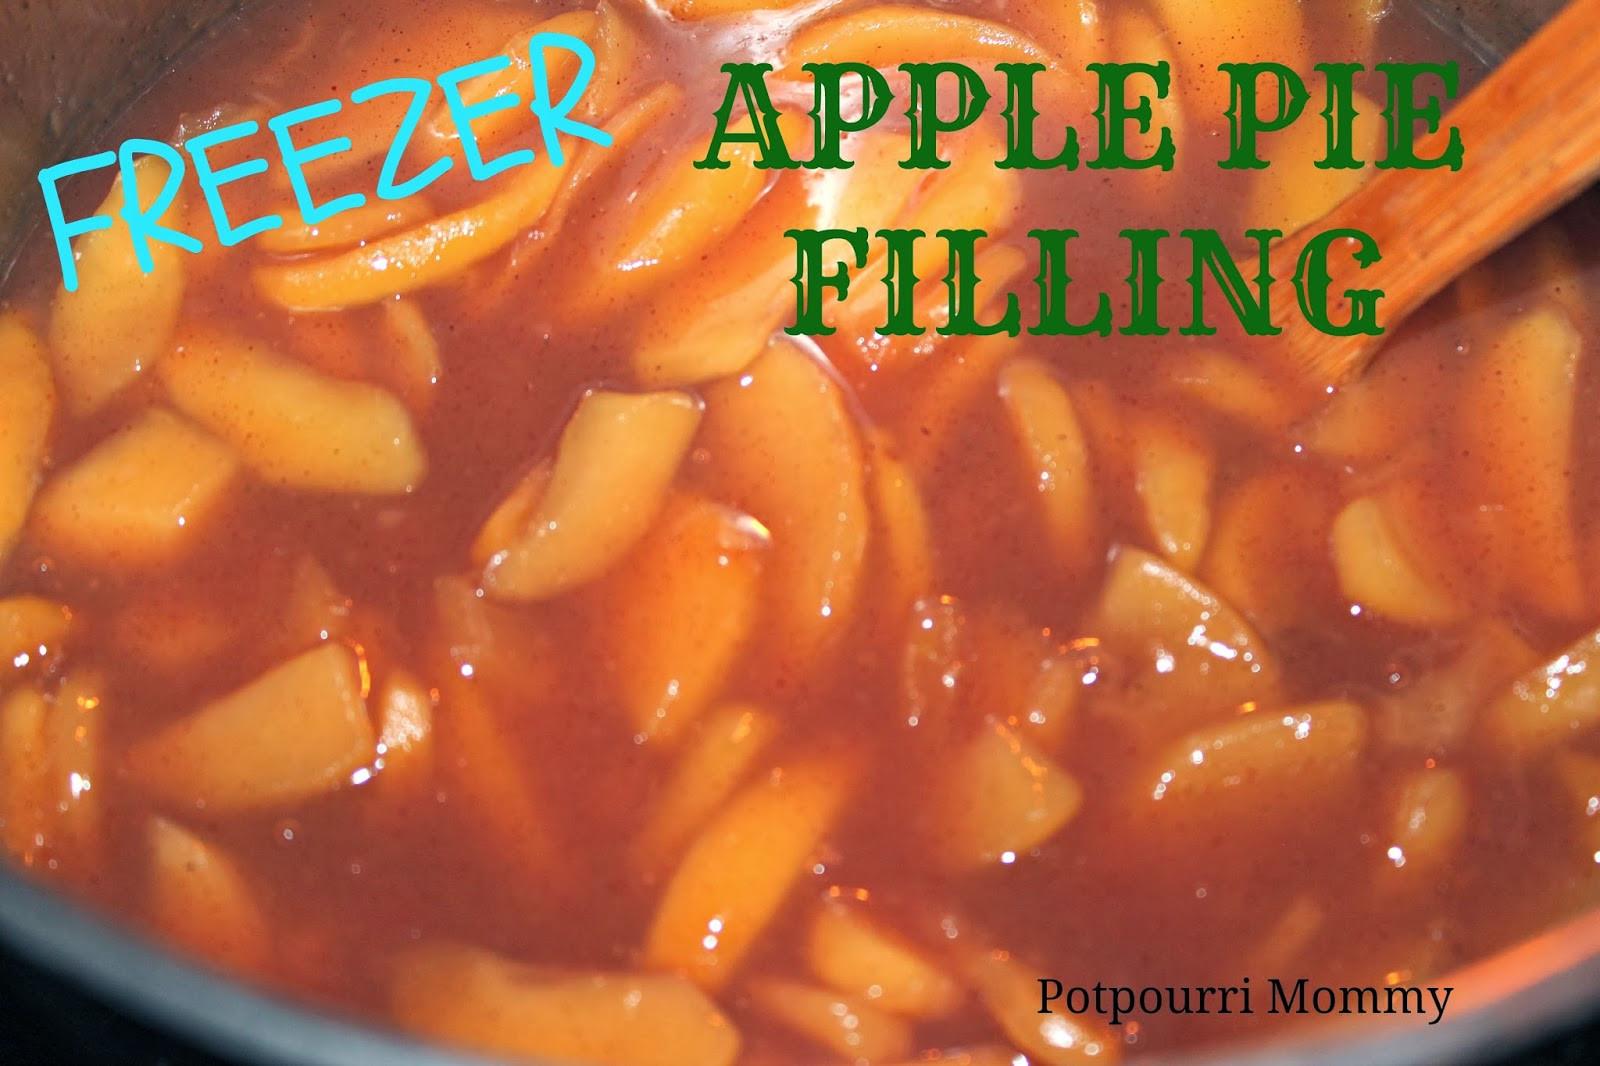 Freezer Apple Pie Filling  Potpourri Mommy Freezer Apple Pie Filling